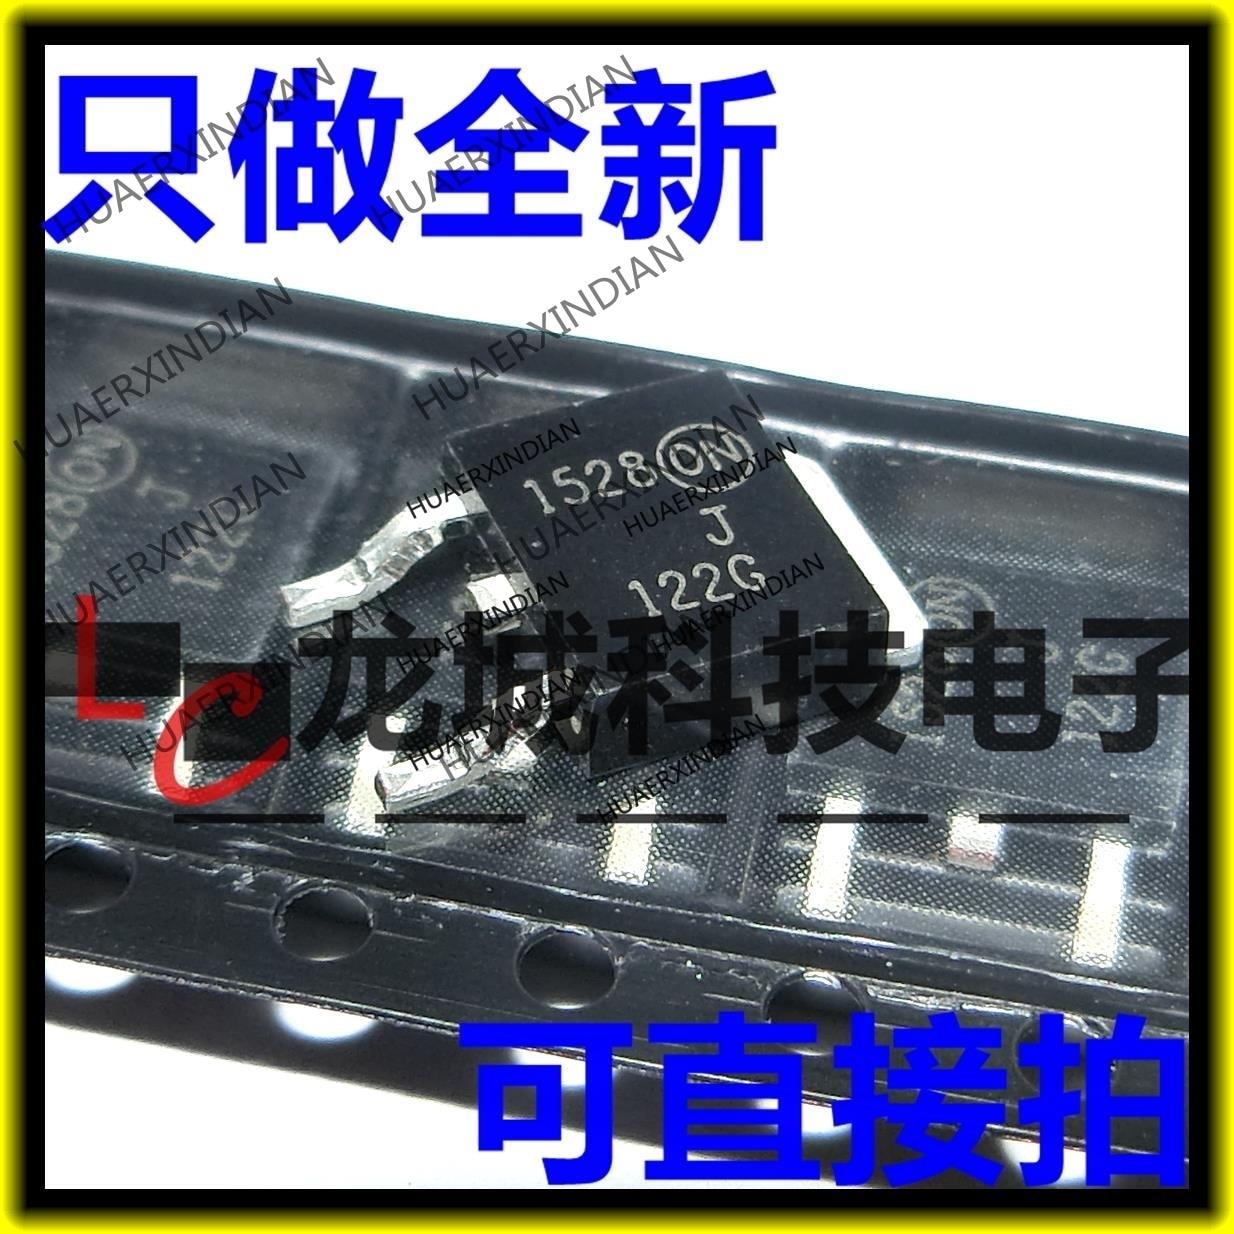 10 unids/lote nueva MJD122G MJD122T4G J122G TIP122 SOT-252 en stock